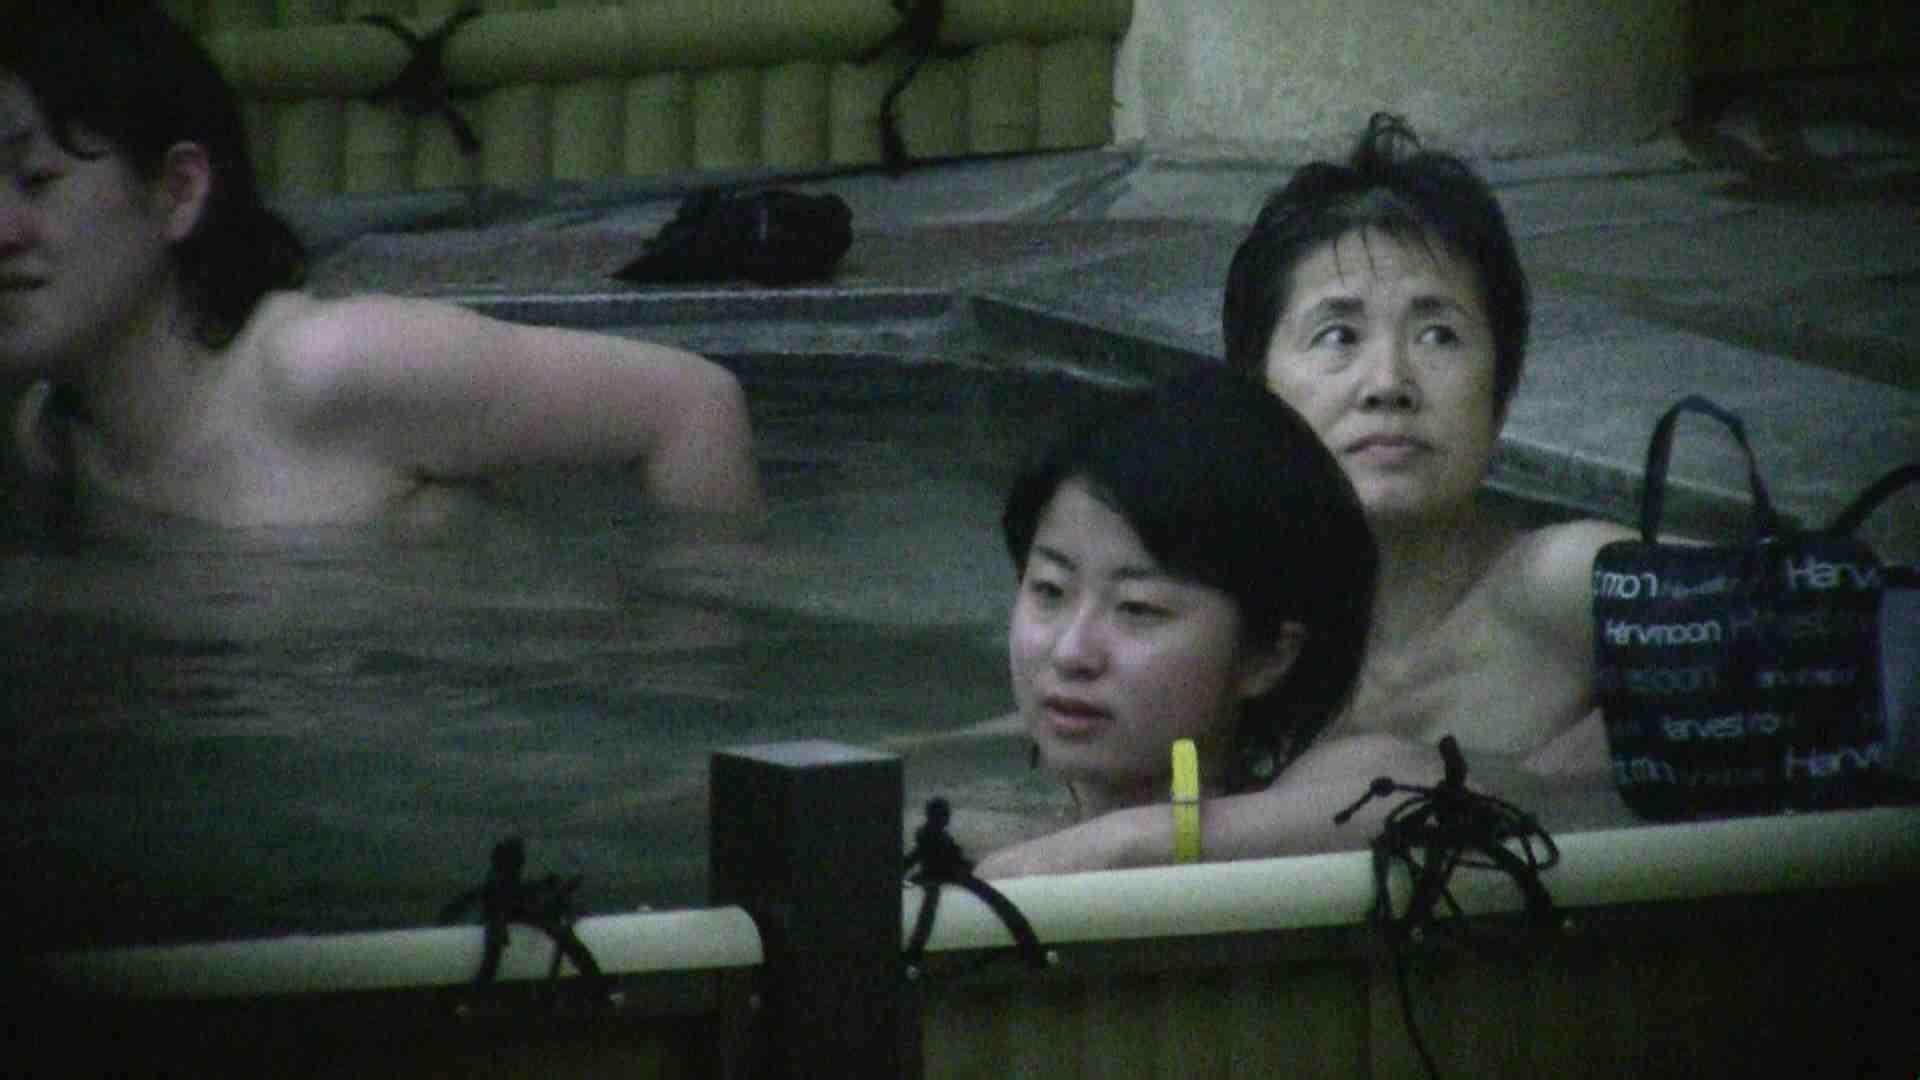 Aquaな露天風呂Vol.112 0  68連発 16